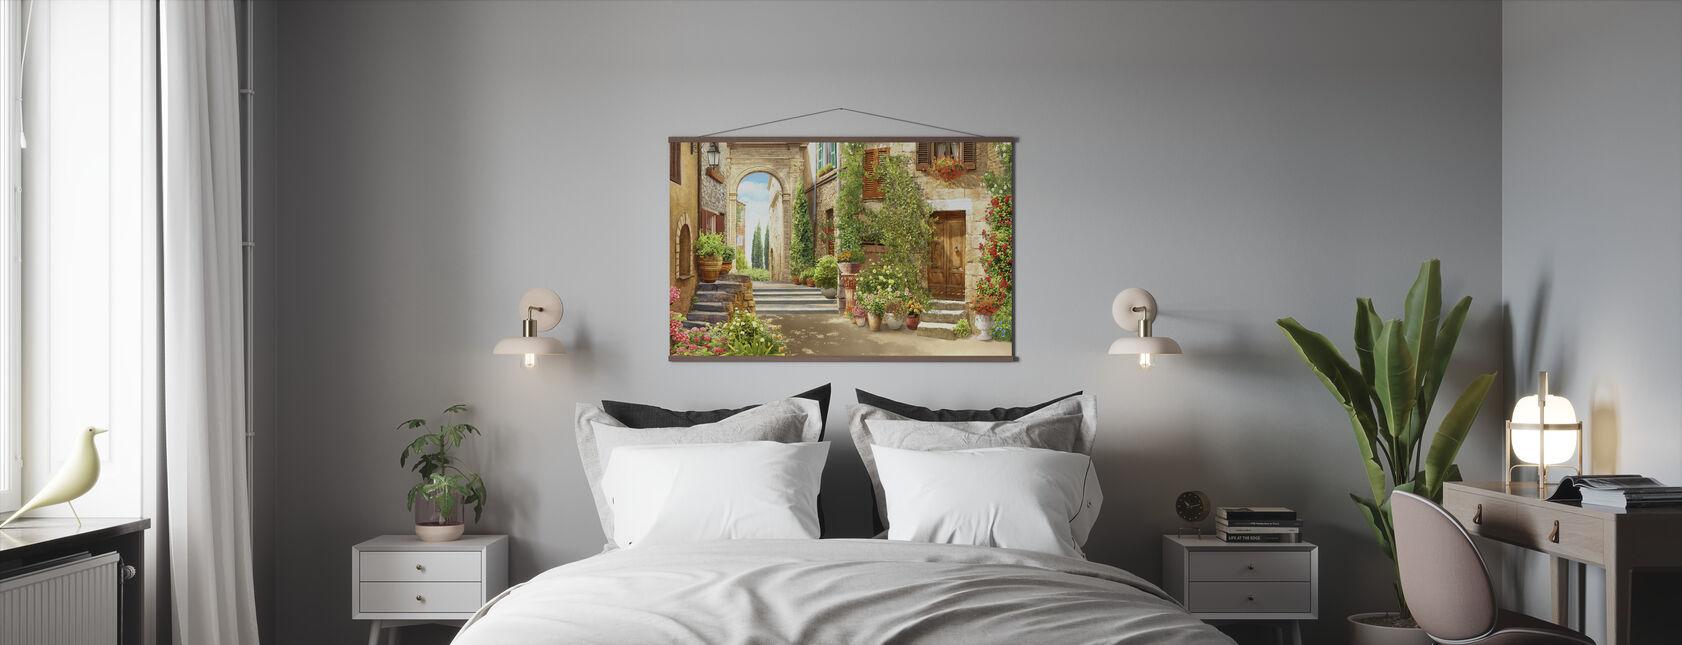 Gårdspladsen - Plakat - Soveværelse